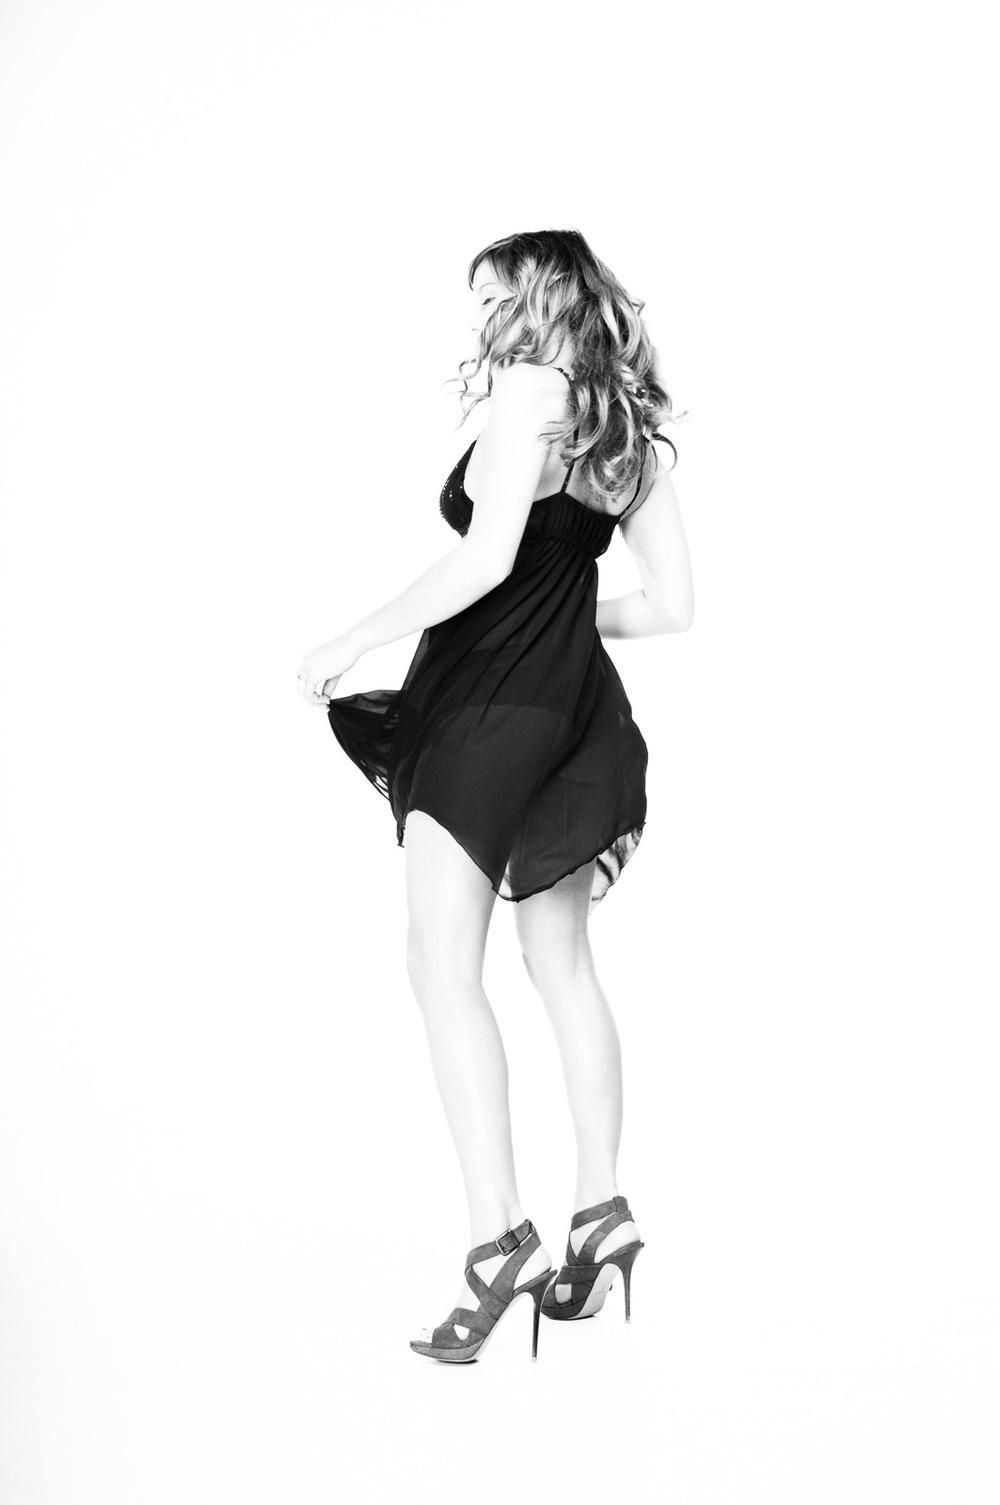 Bernard_Panier-FashionLike-011.jpg